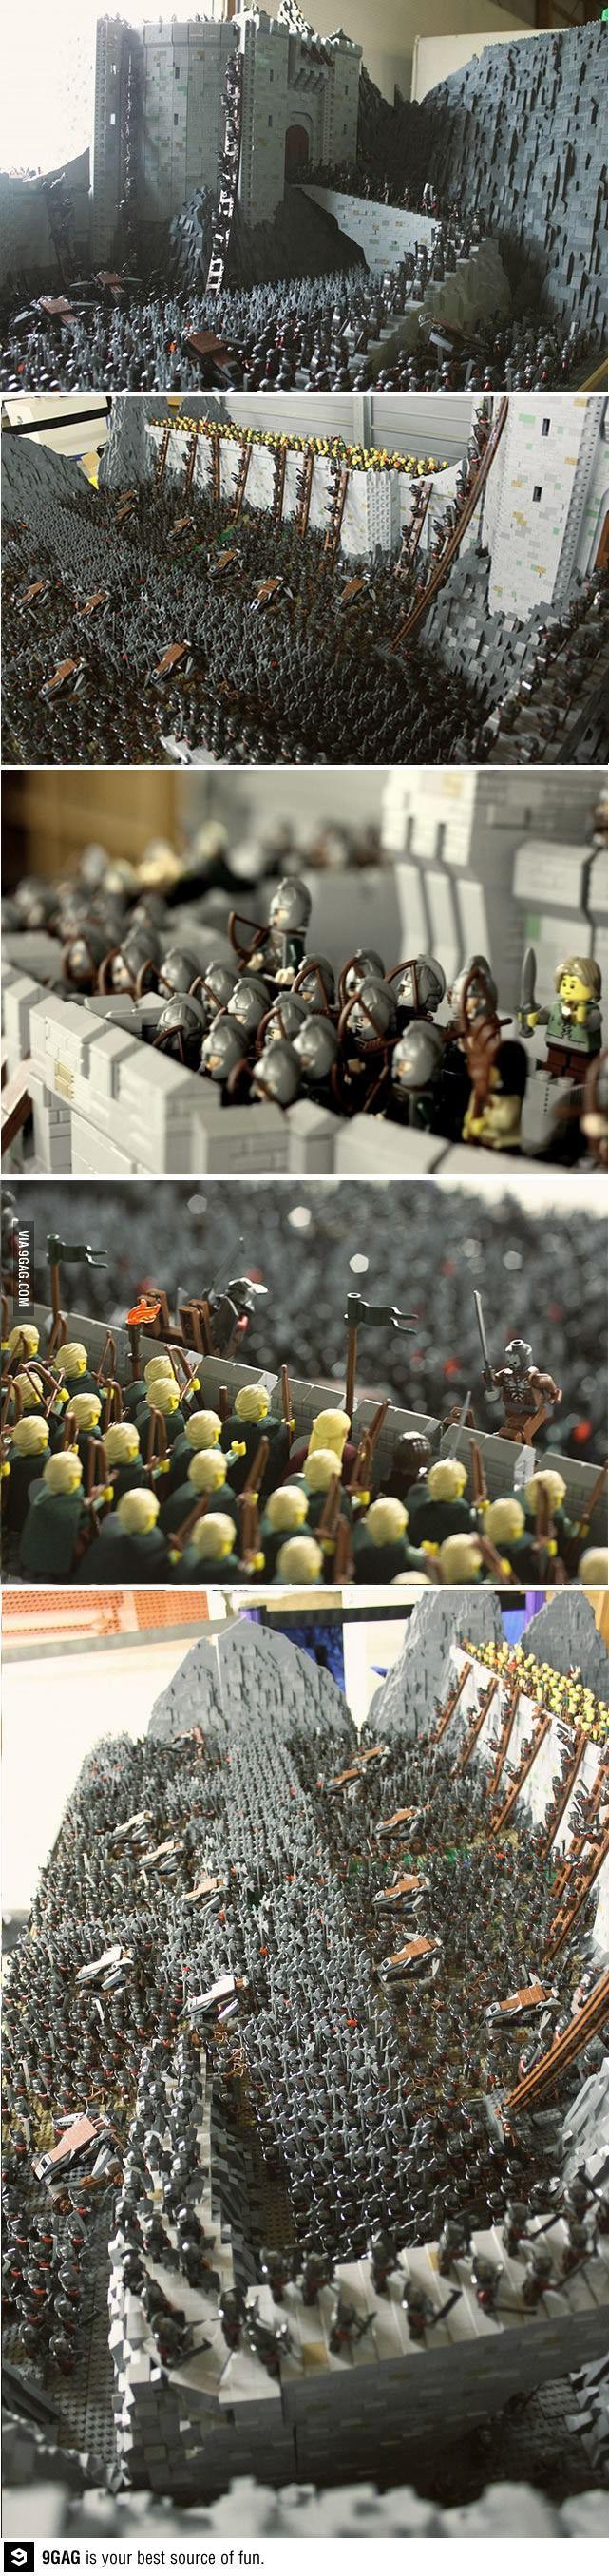 LOTR Battle Of Helms Deep Recreated with 150K LEGO Bricks